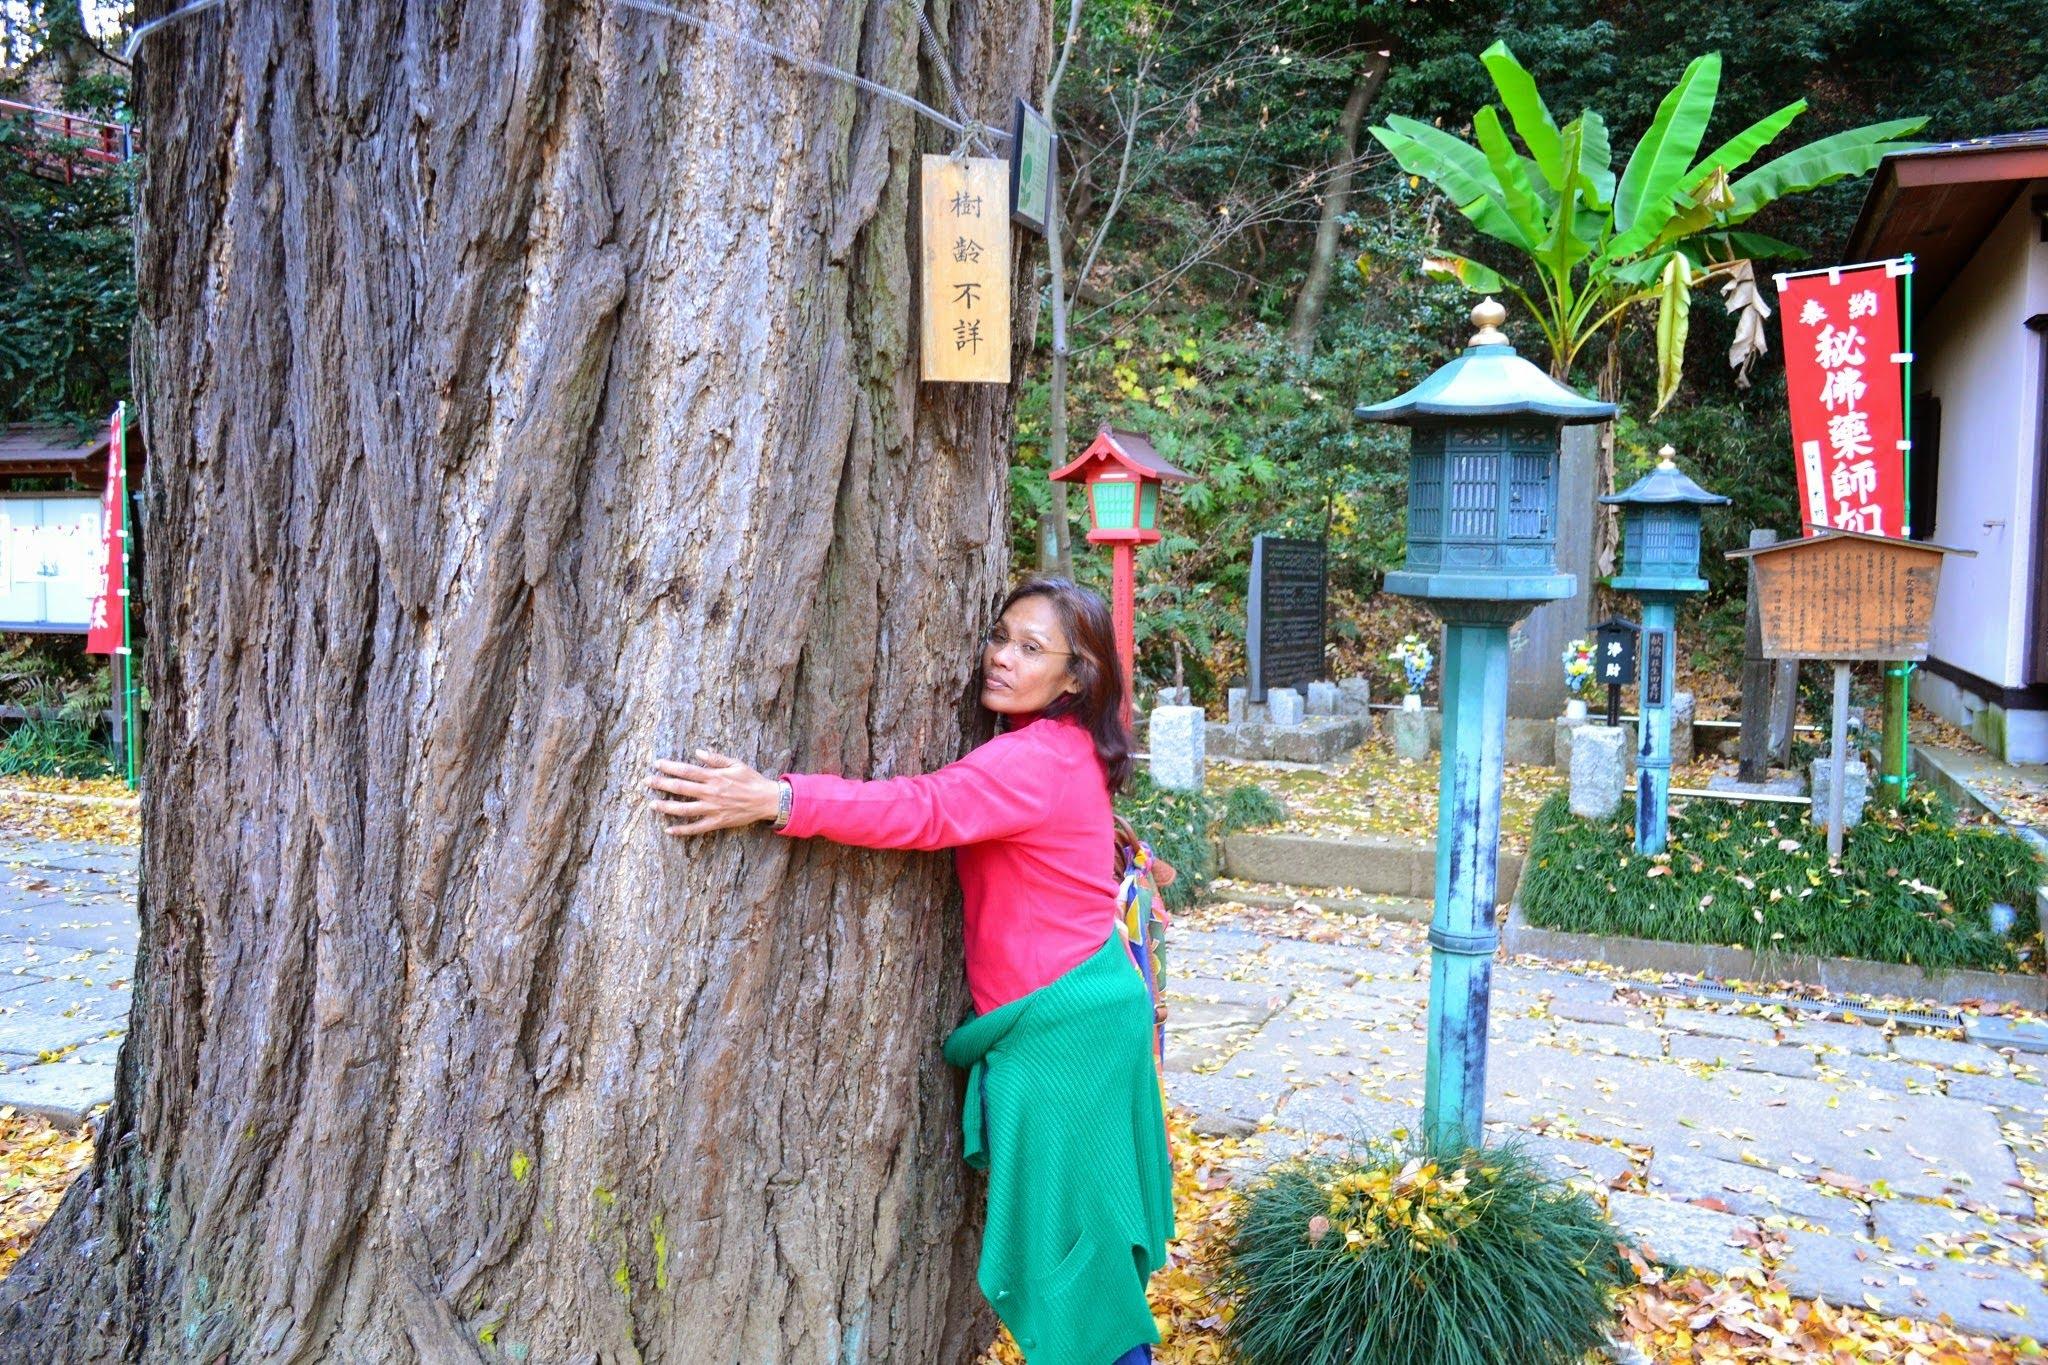 Mala is a tree hugger!